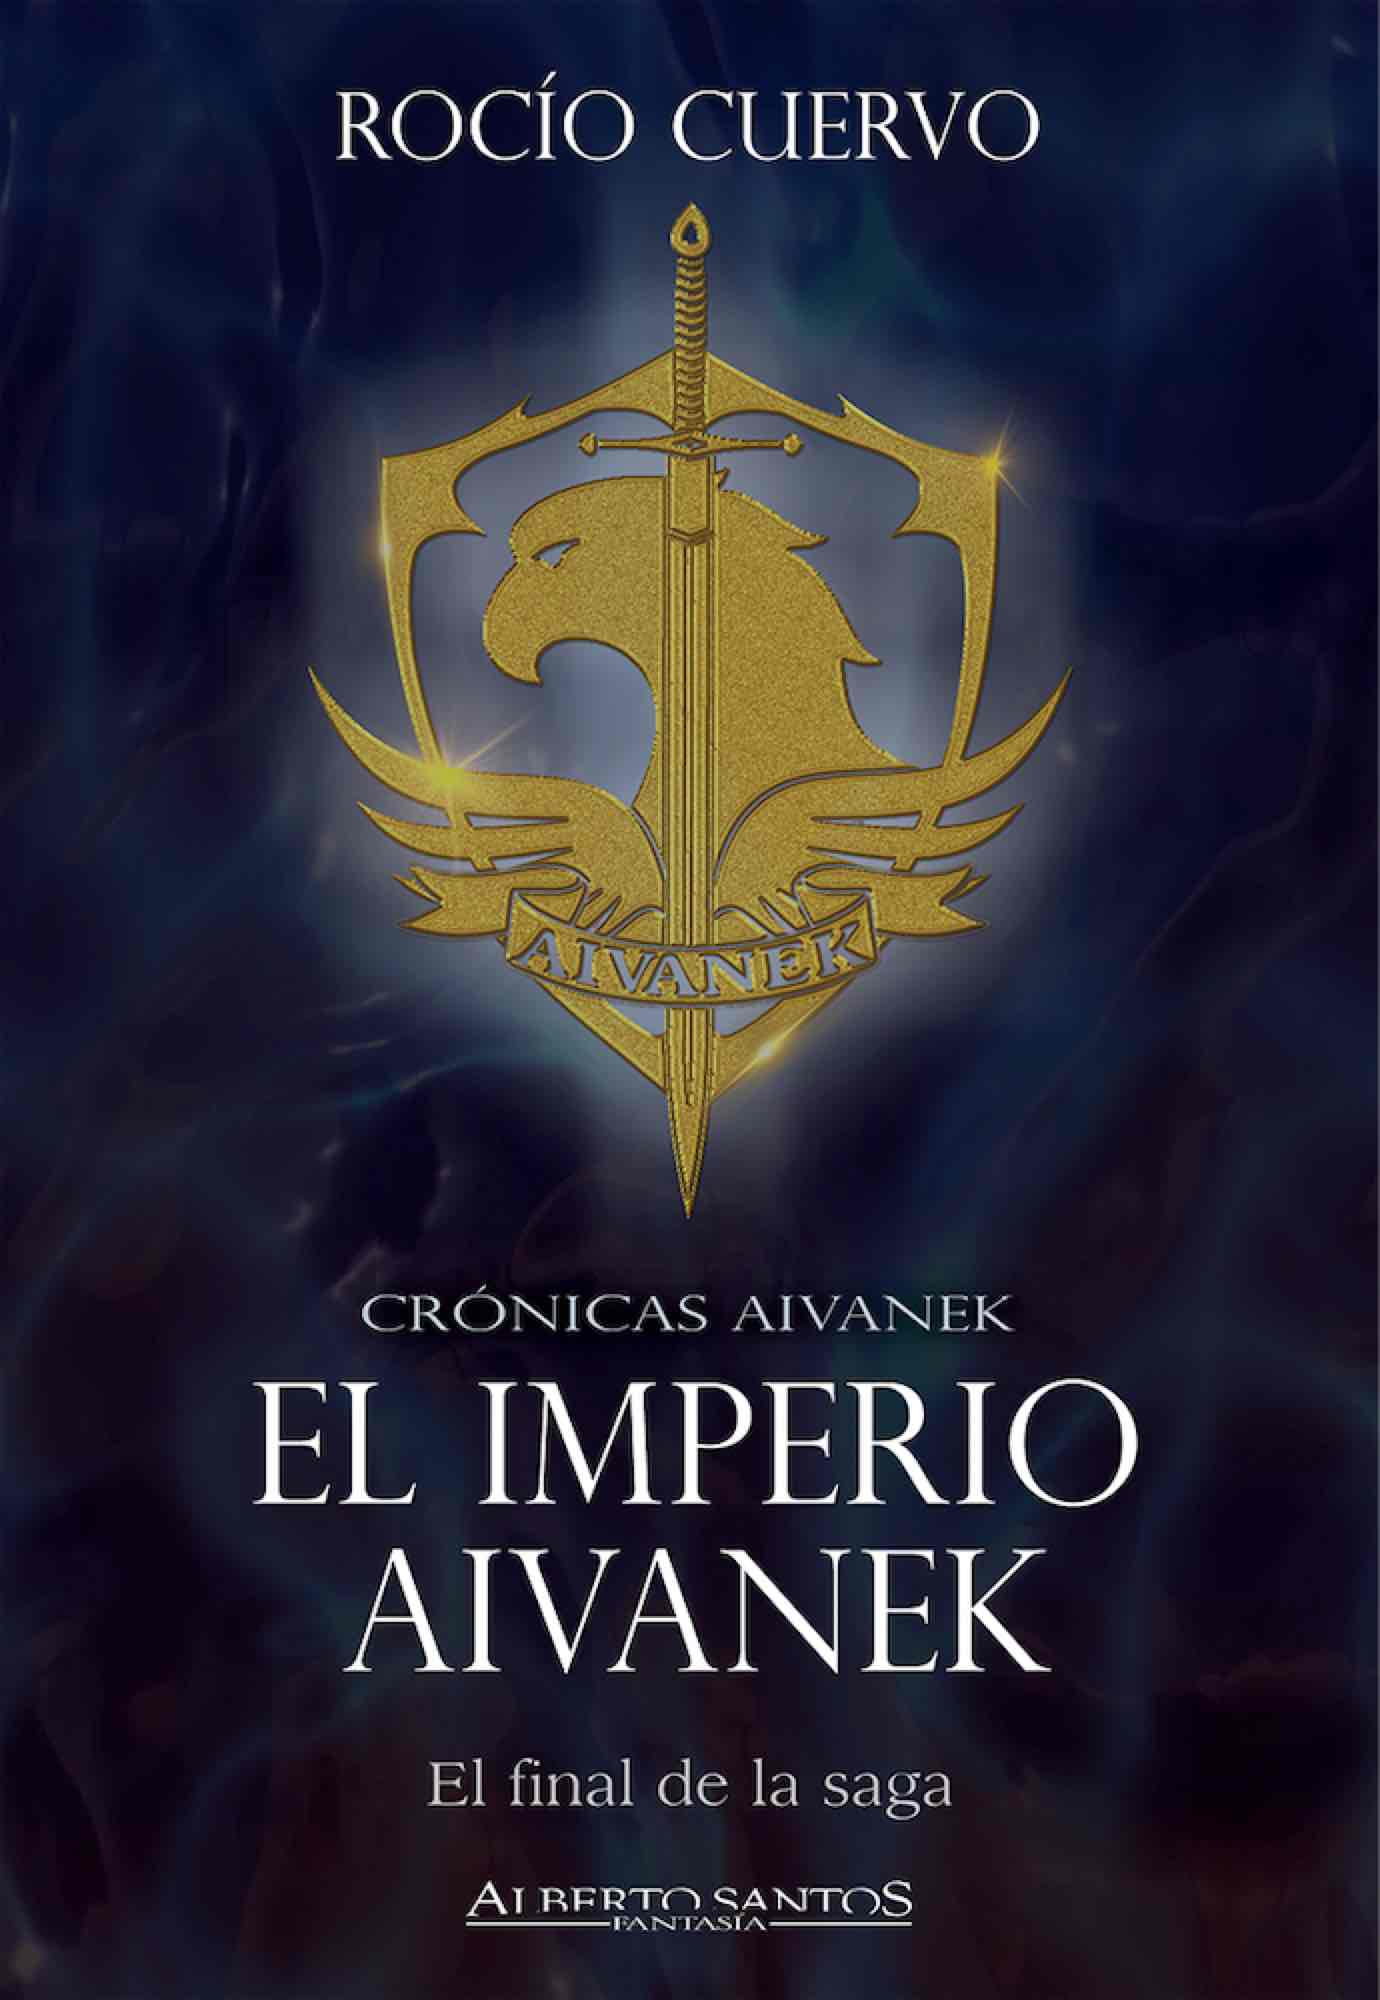 EL IMPERIO AIVANEK